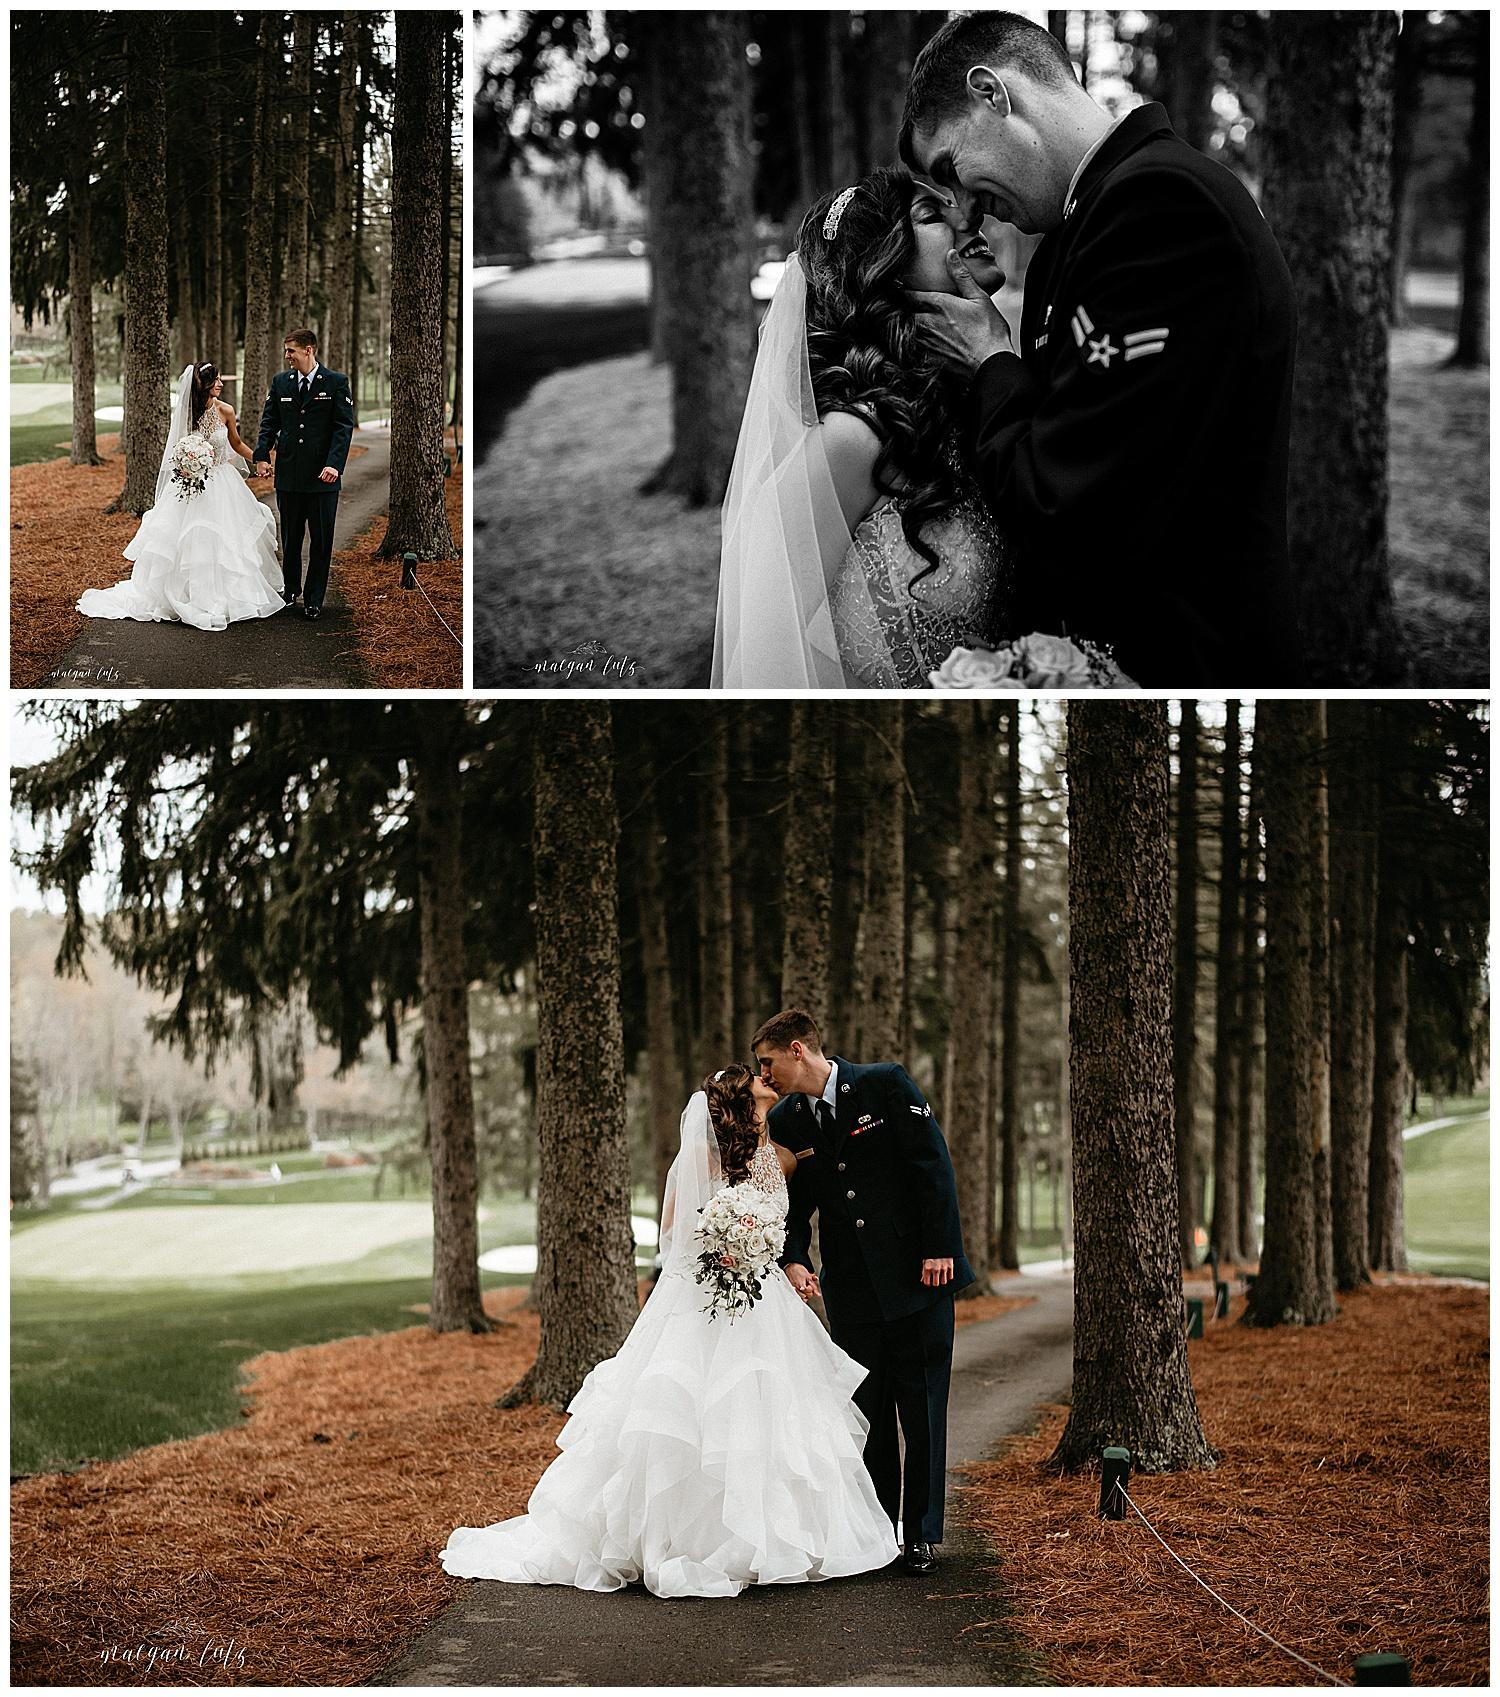 NEPA-Lehigh-Valley-Wedding-Photographer-at-Glen-Oak-Country-Club-Clarks-Summit-PA_0026.jpg